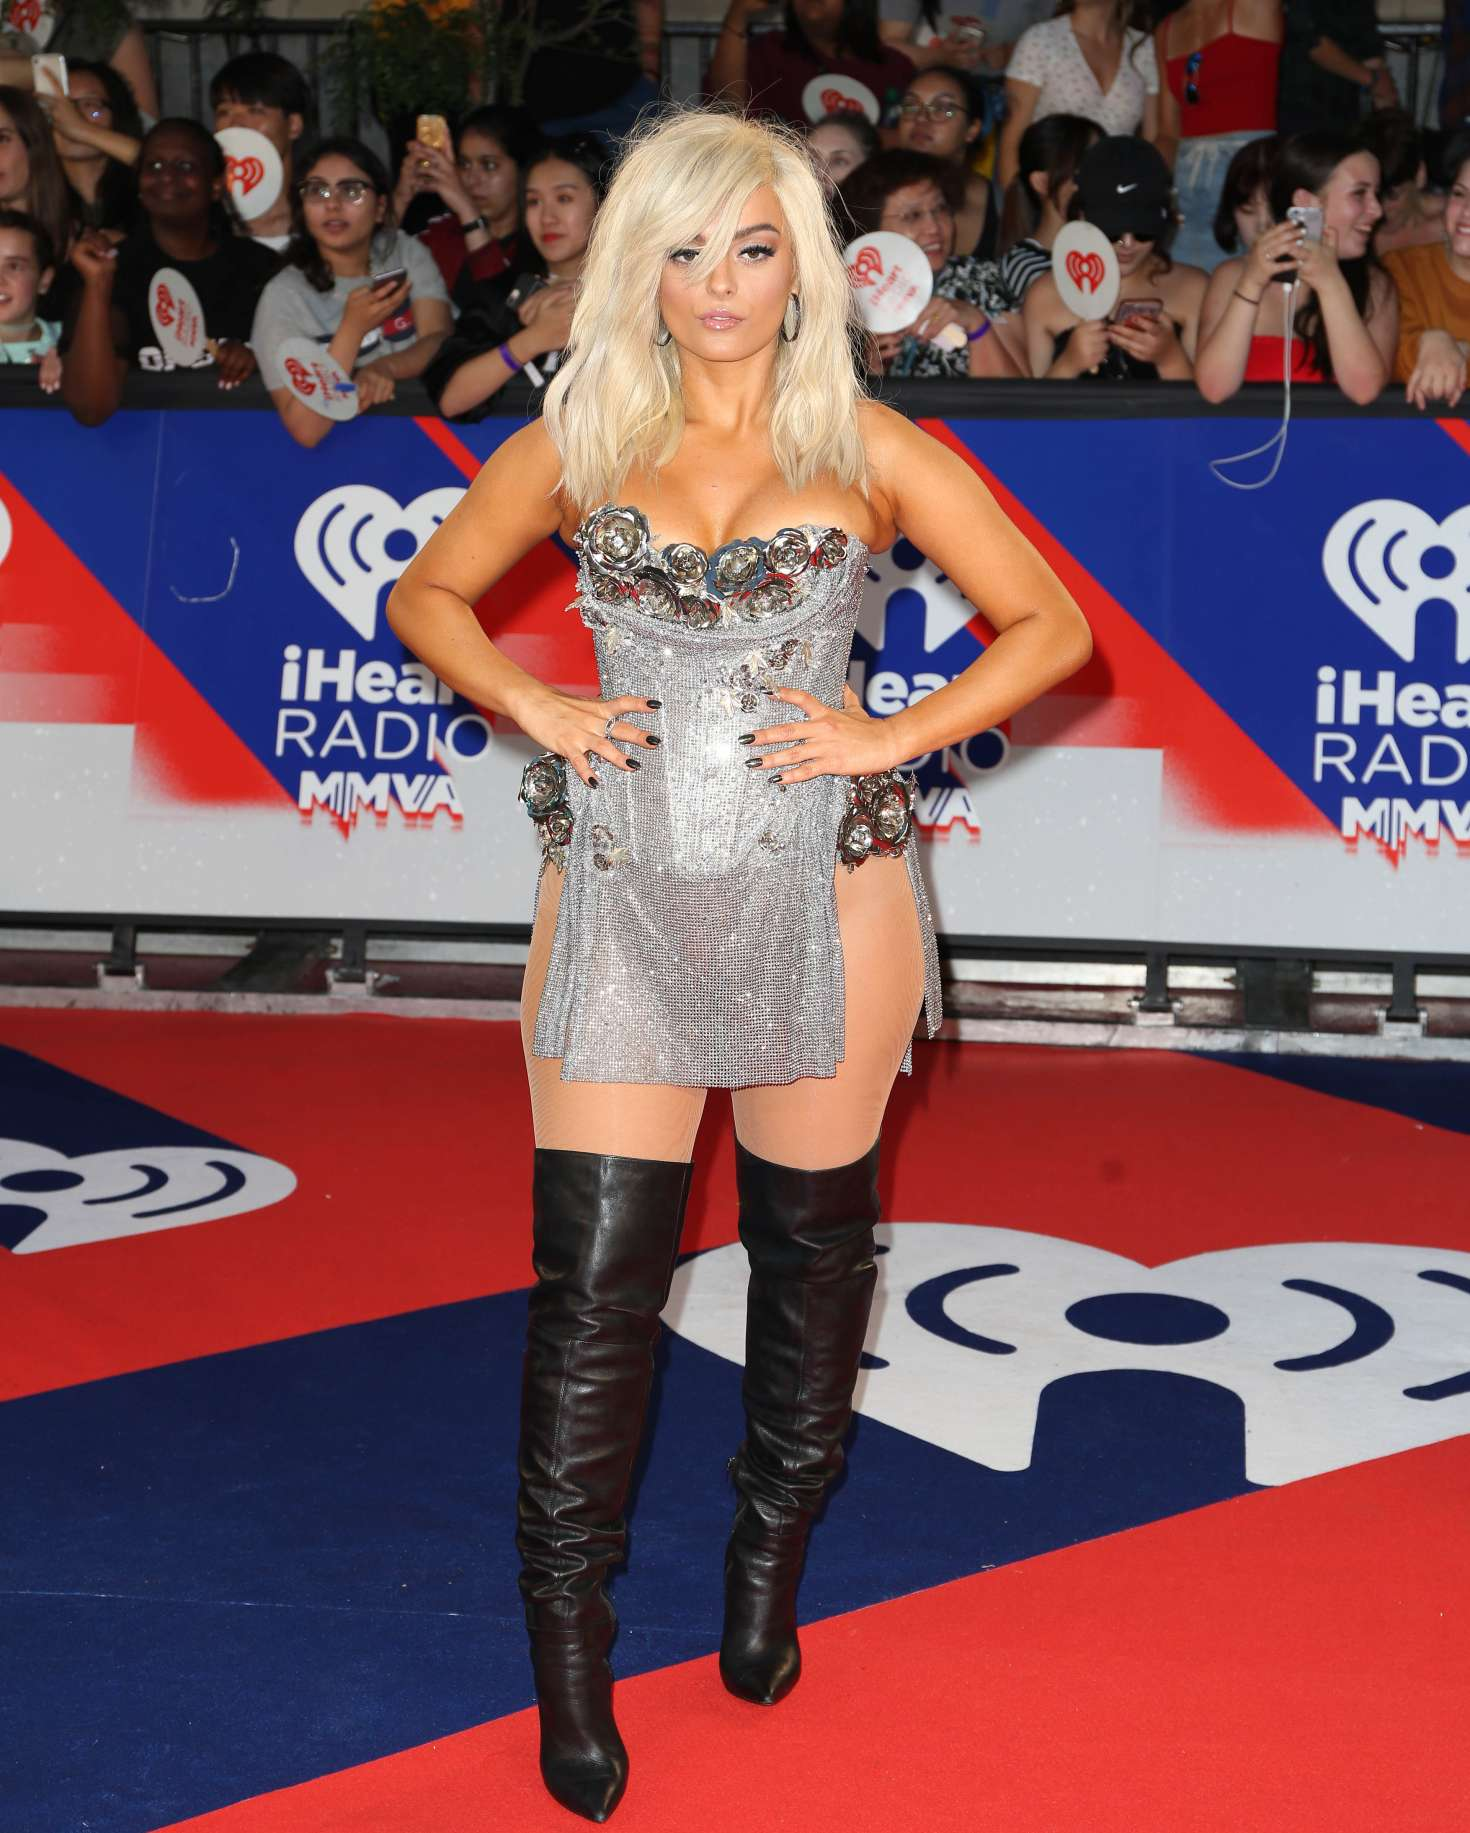 Bebe Rexha - 2018 iHeartRadio Much Music Video Awards in Toronto